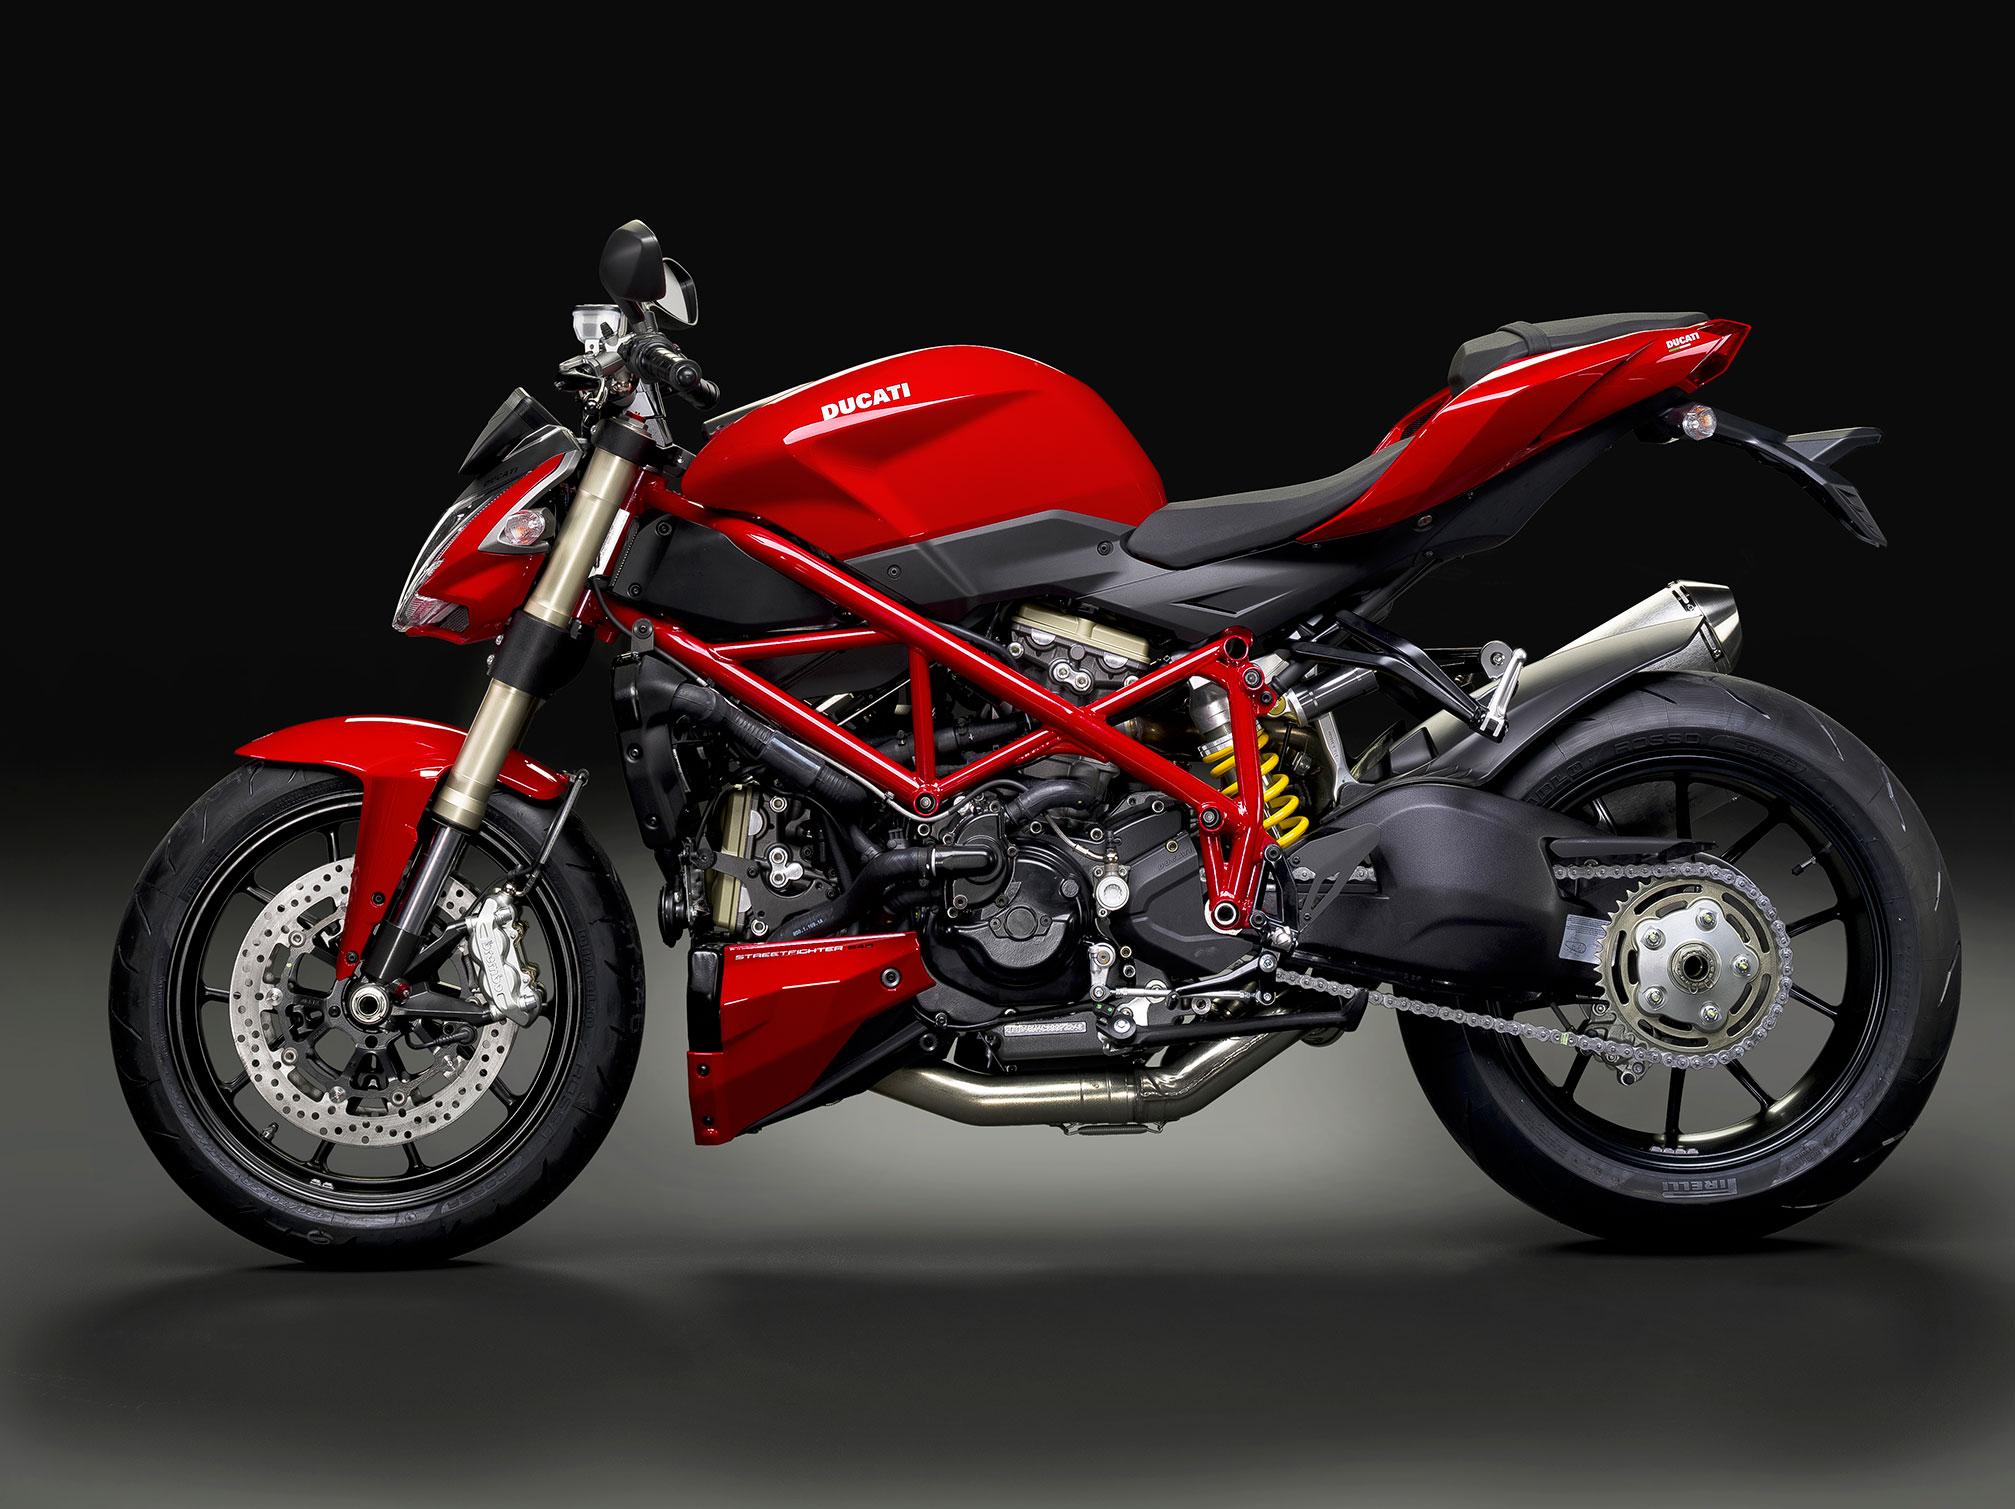 2015 Ducati Streetfighter 848 2